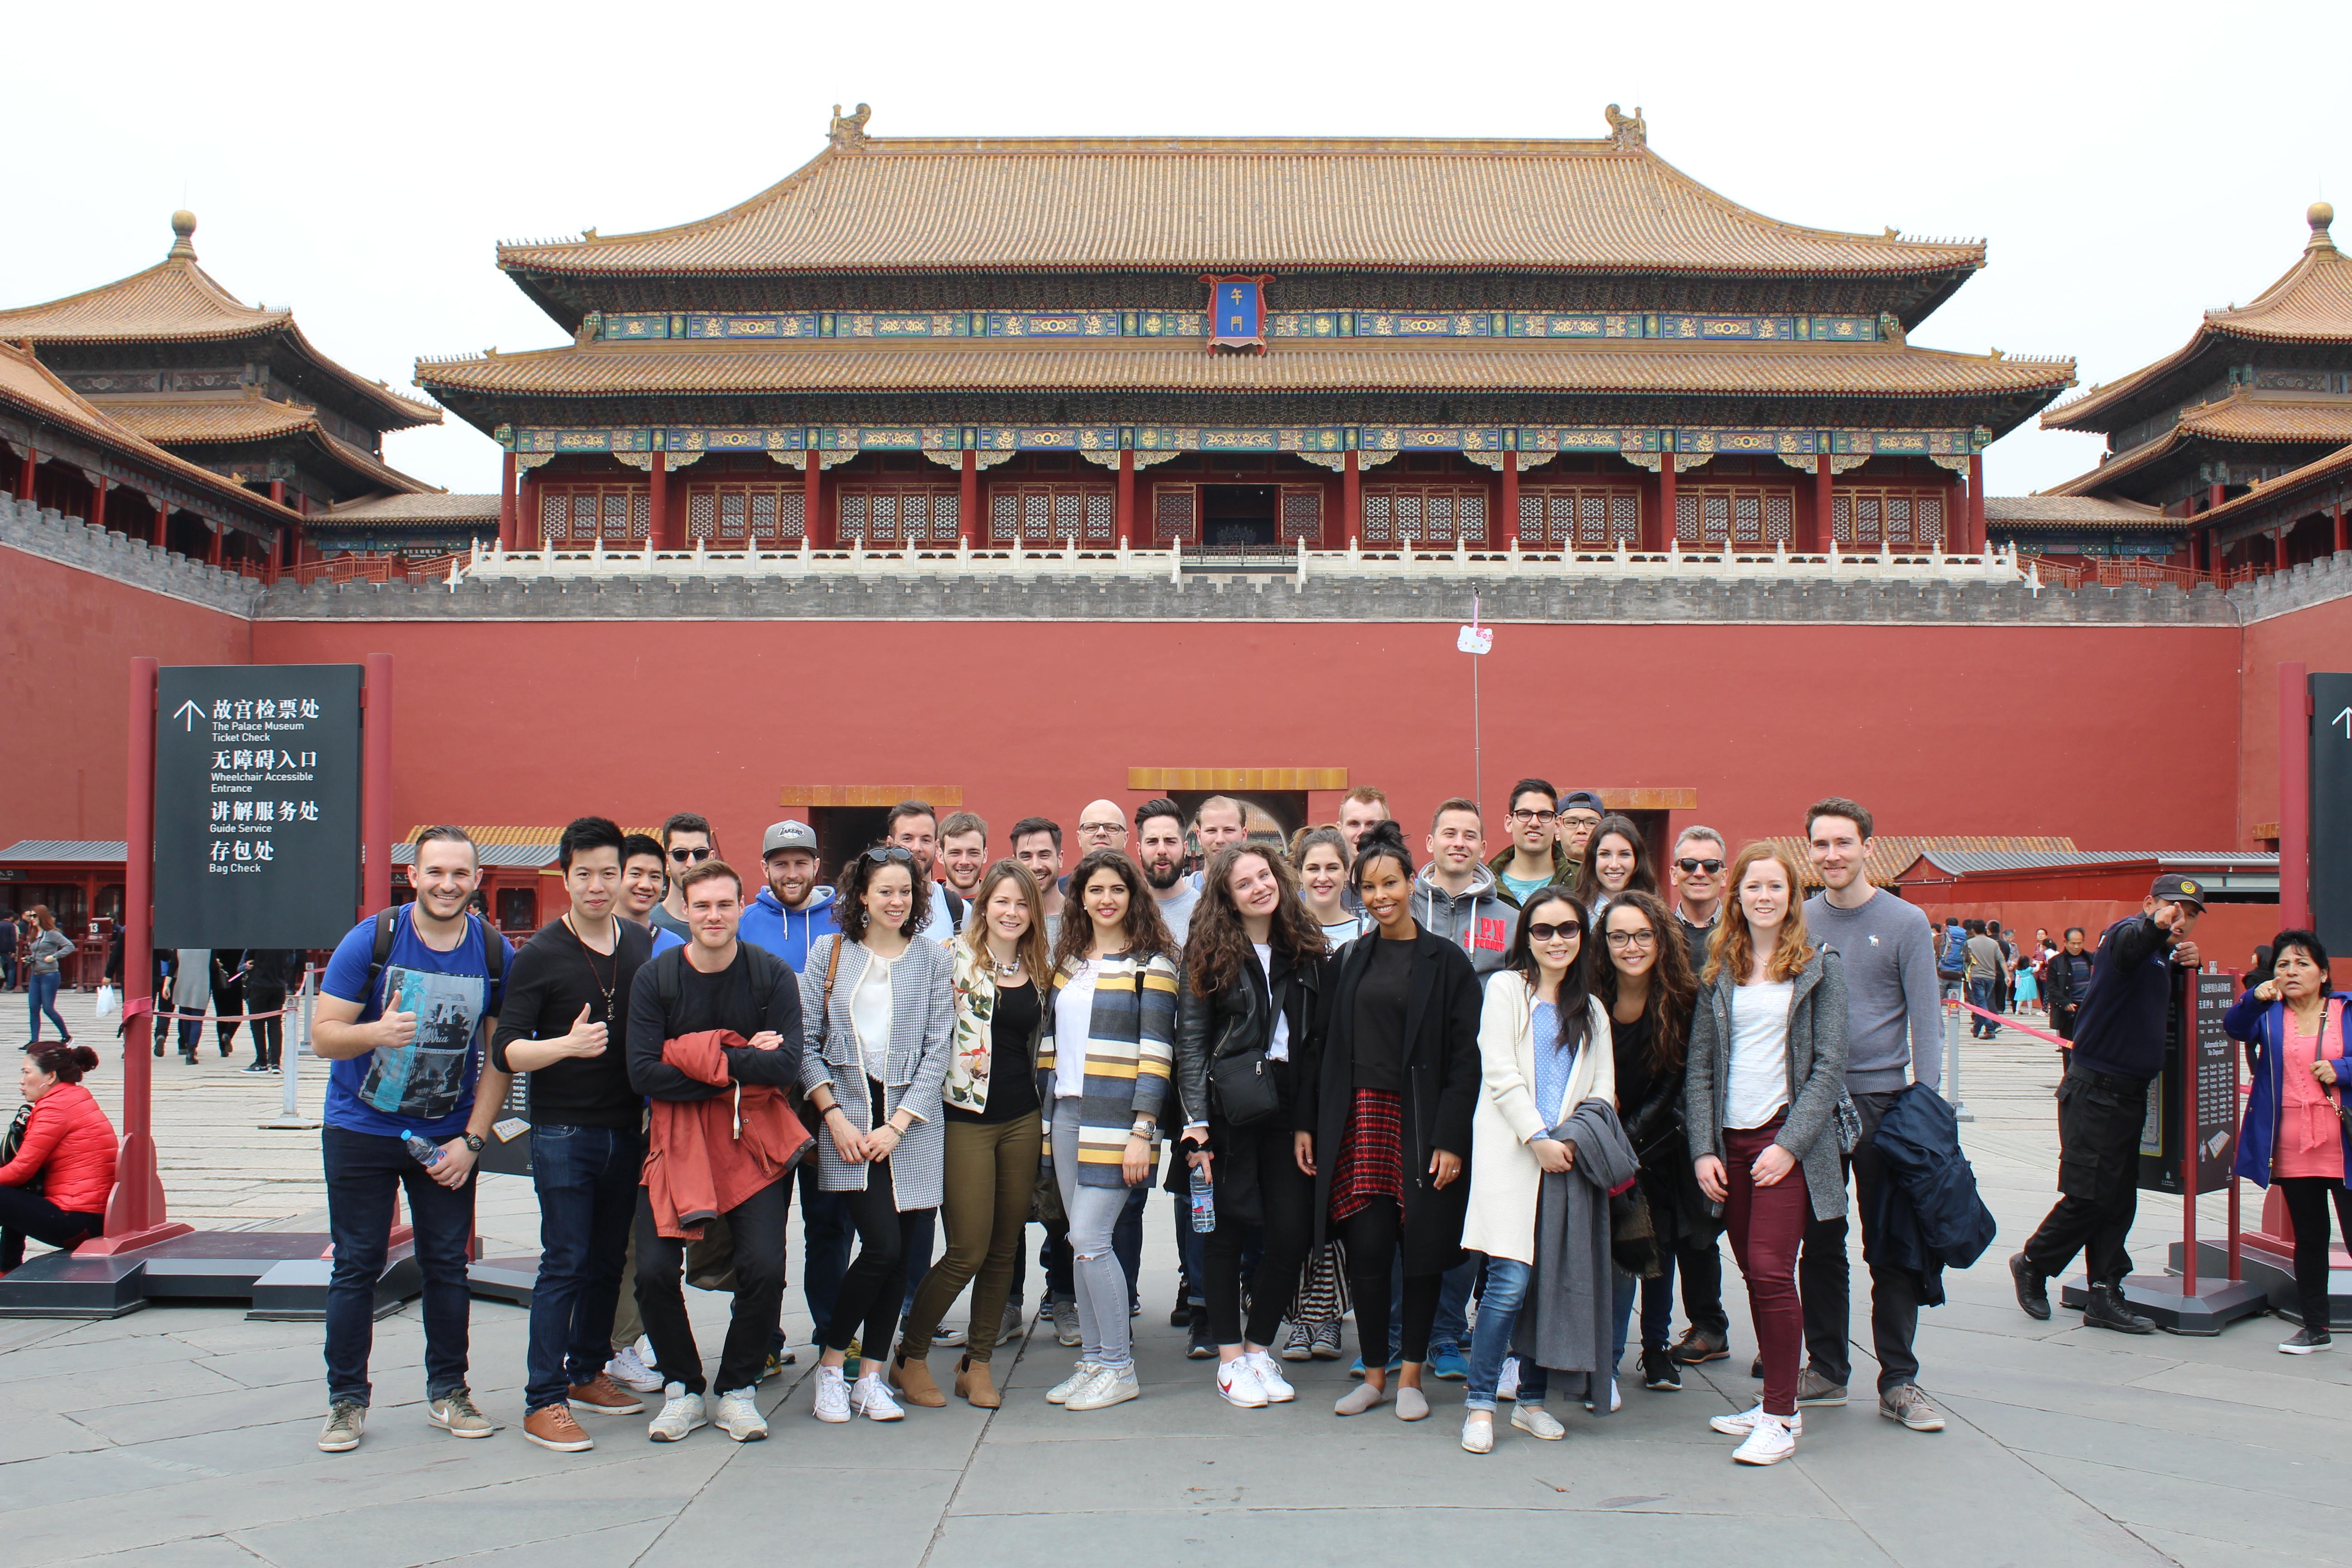 Nĭ Hăo Beijing!